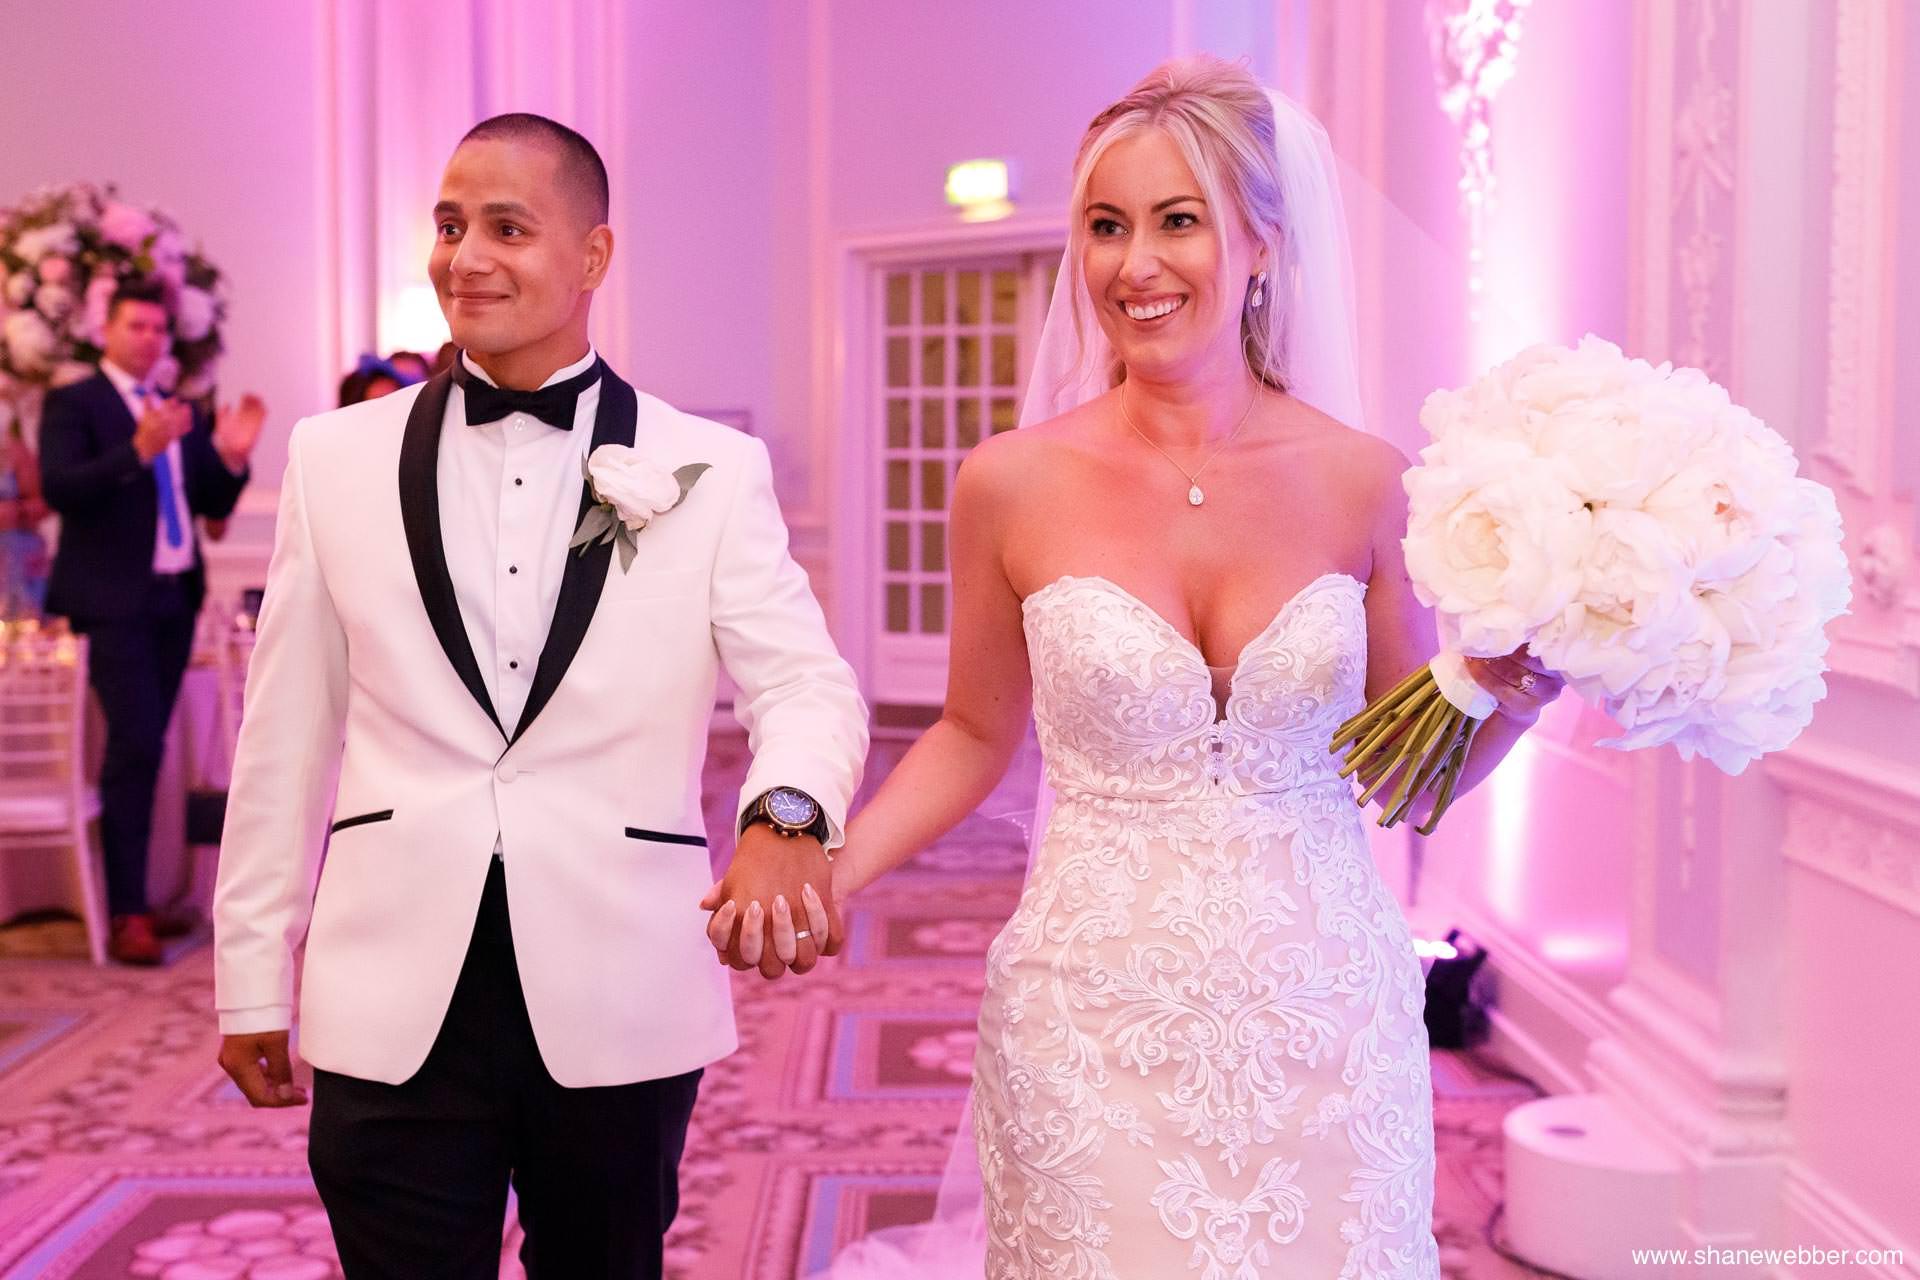 The Midland wedding reception